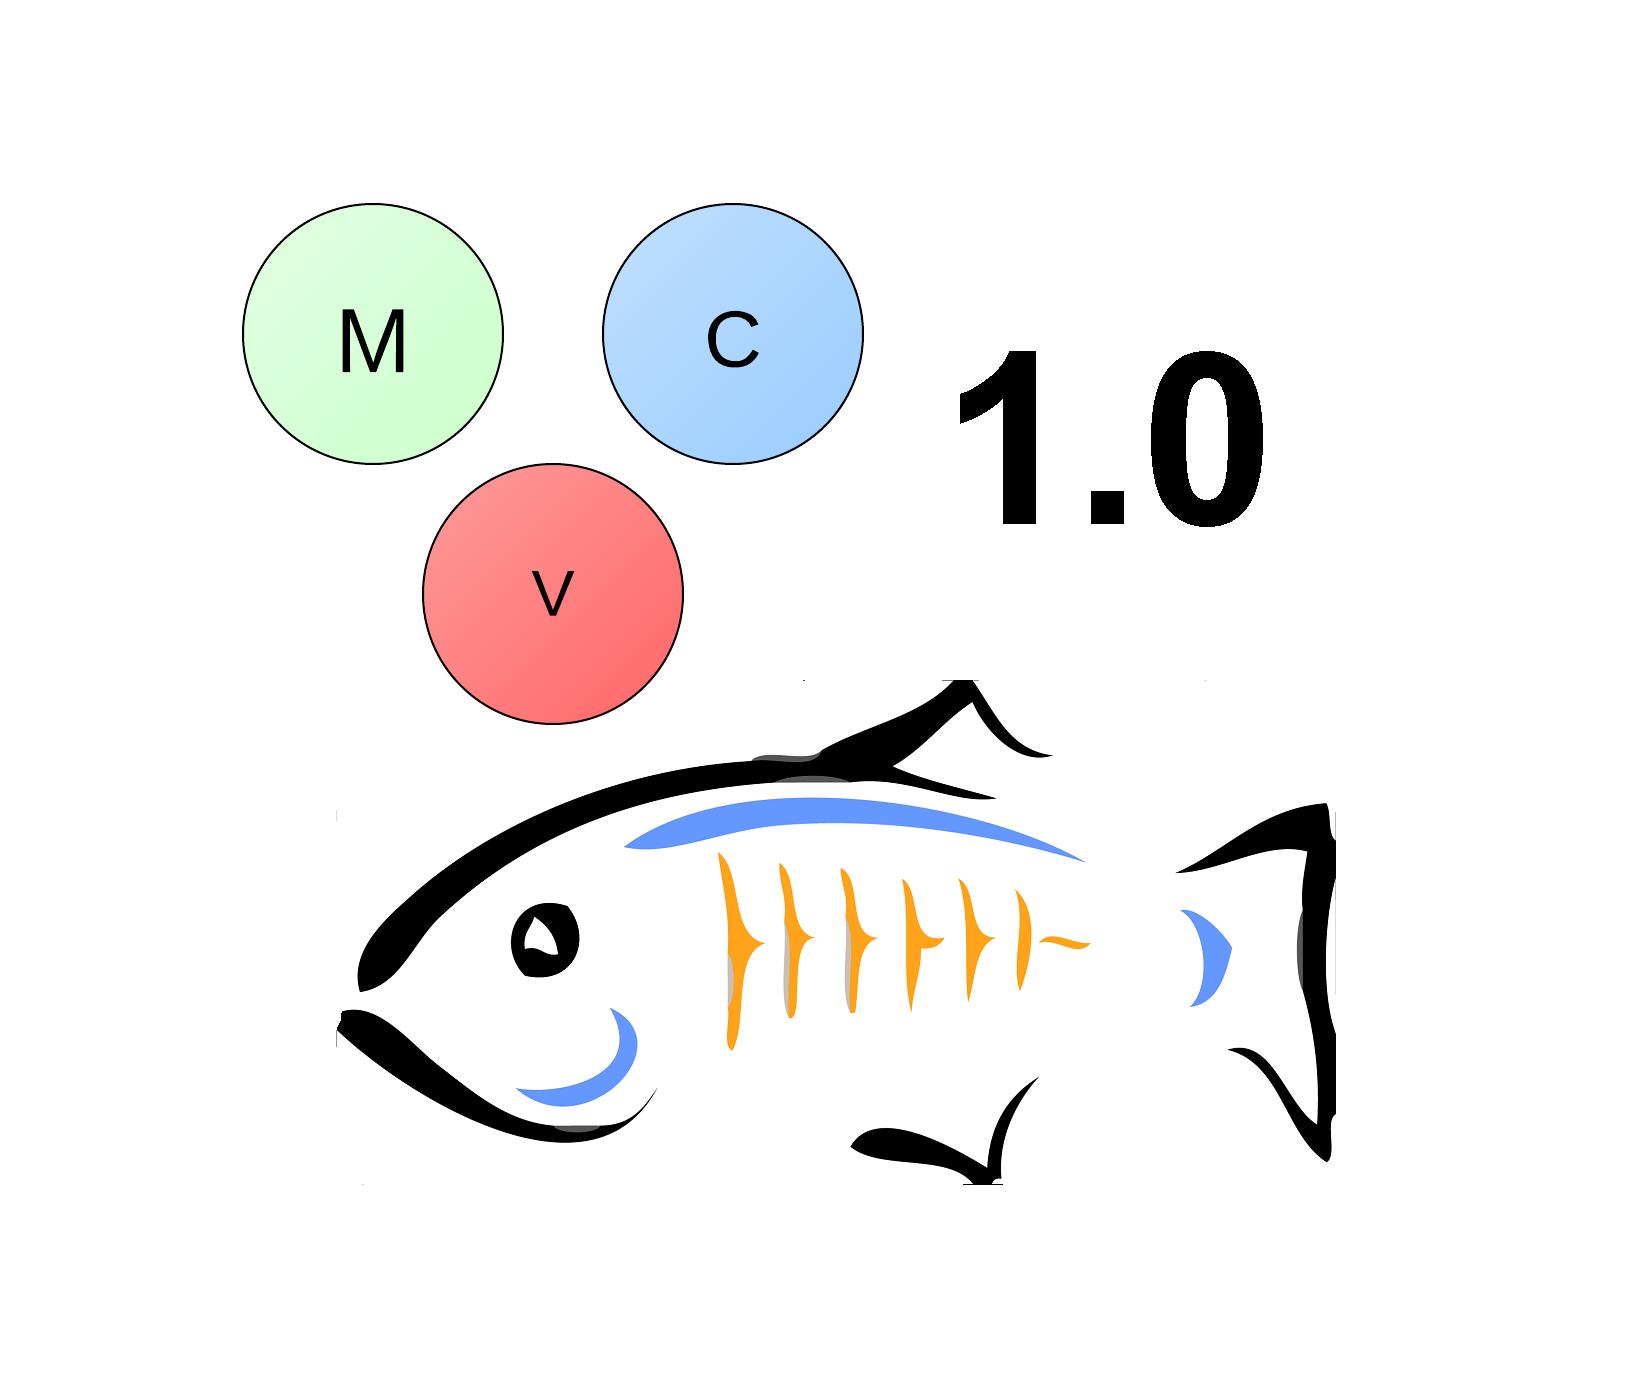 glassfish-5-mvc-1.0-module